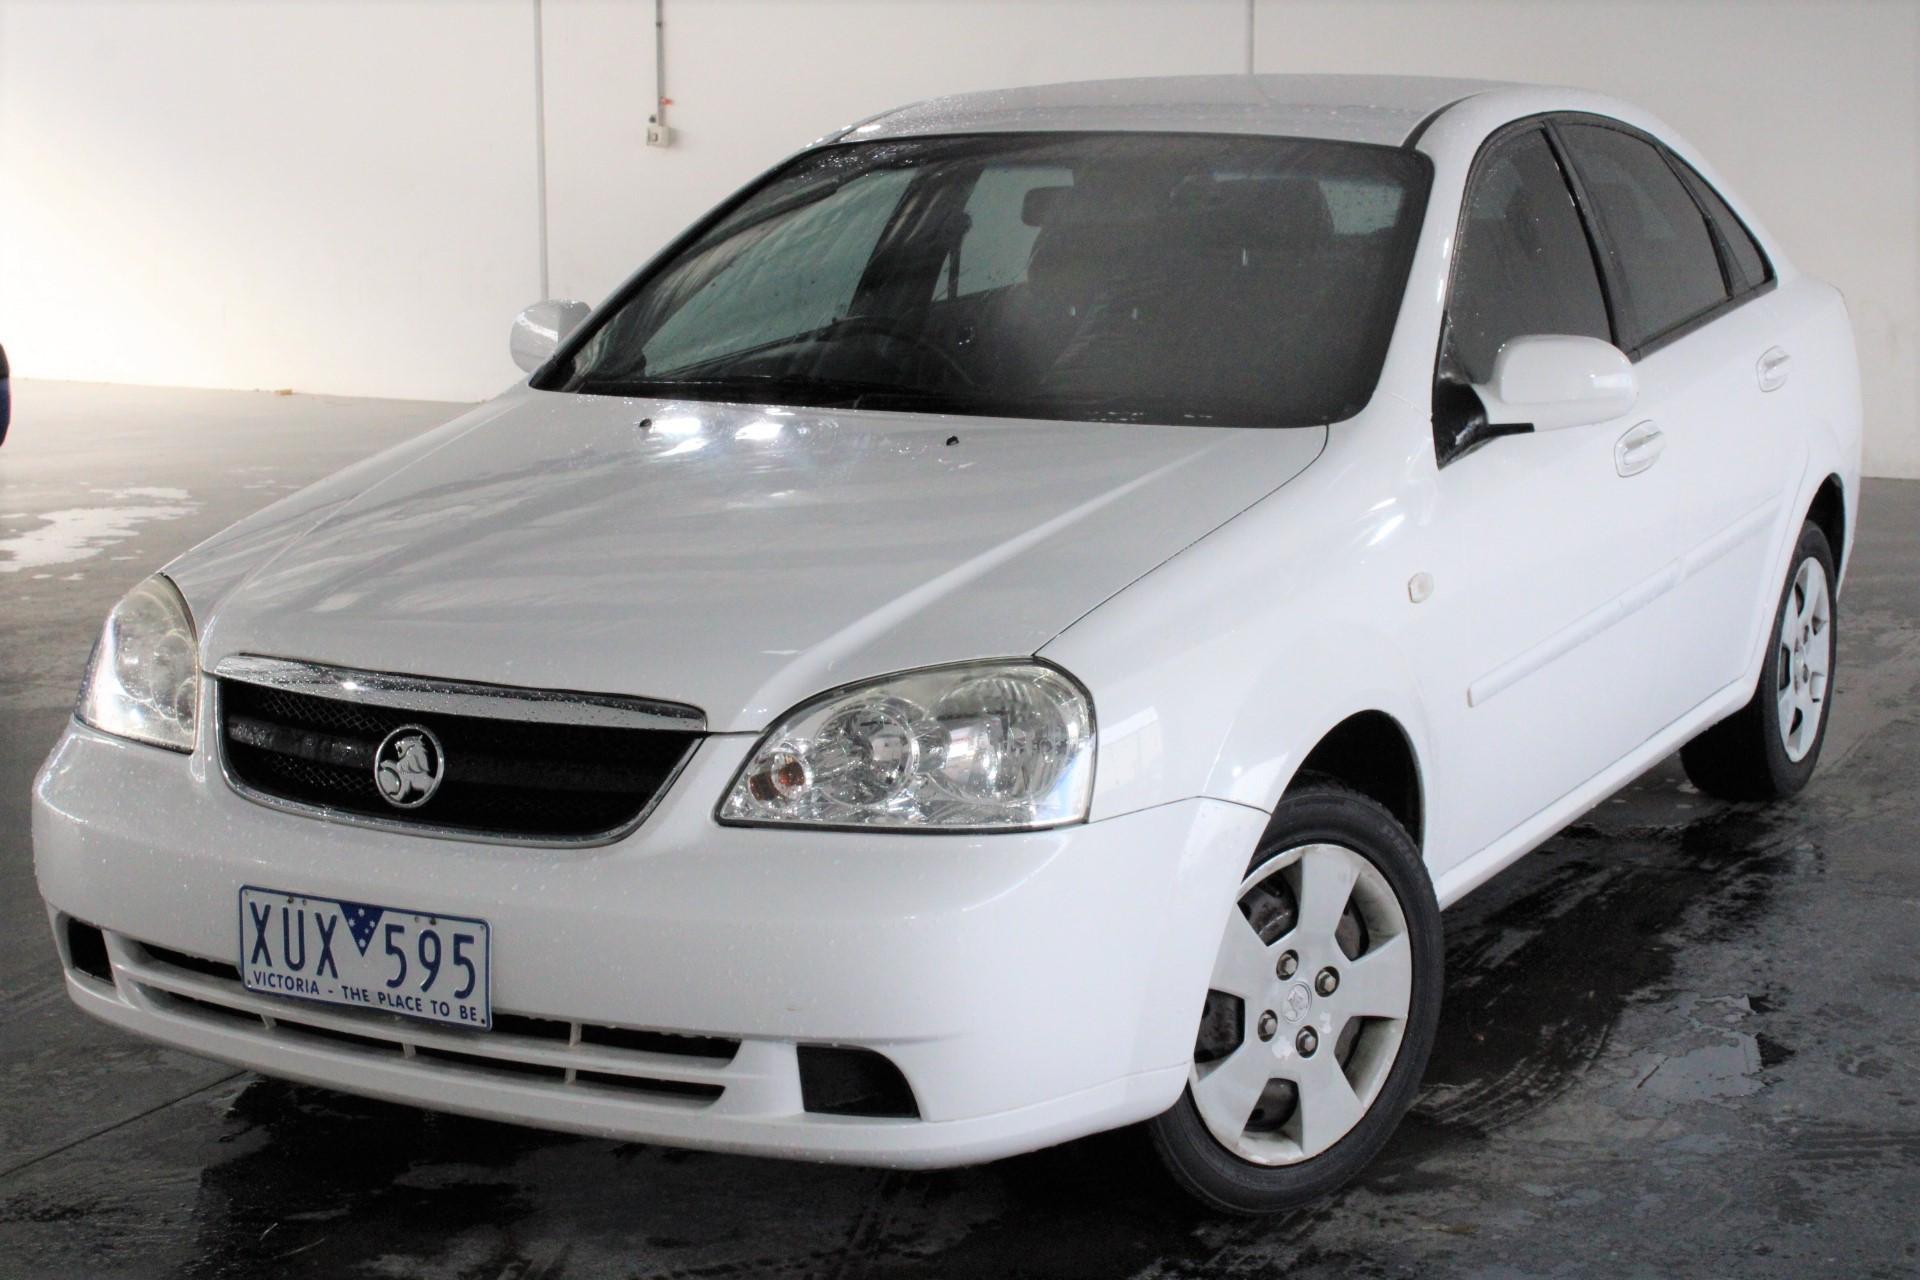 2007 Holden Viva Equipe JF Automatic Sedan (WOVR Inspected)